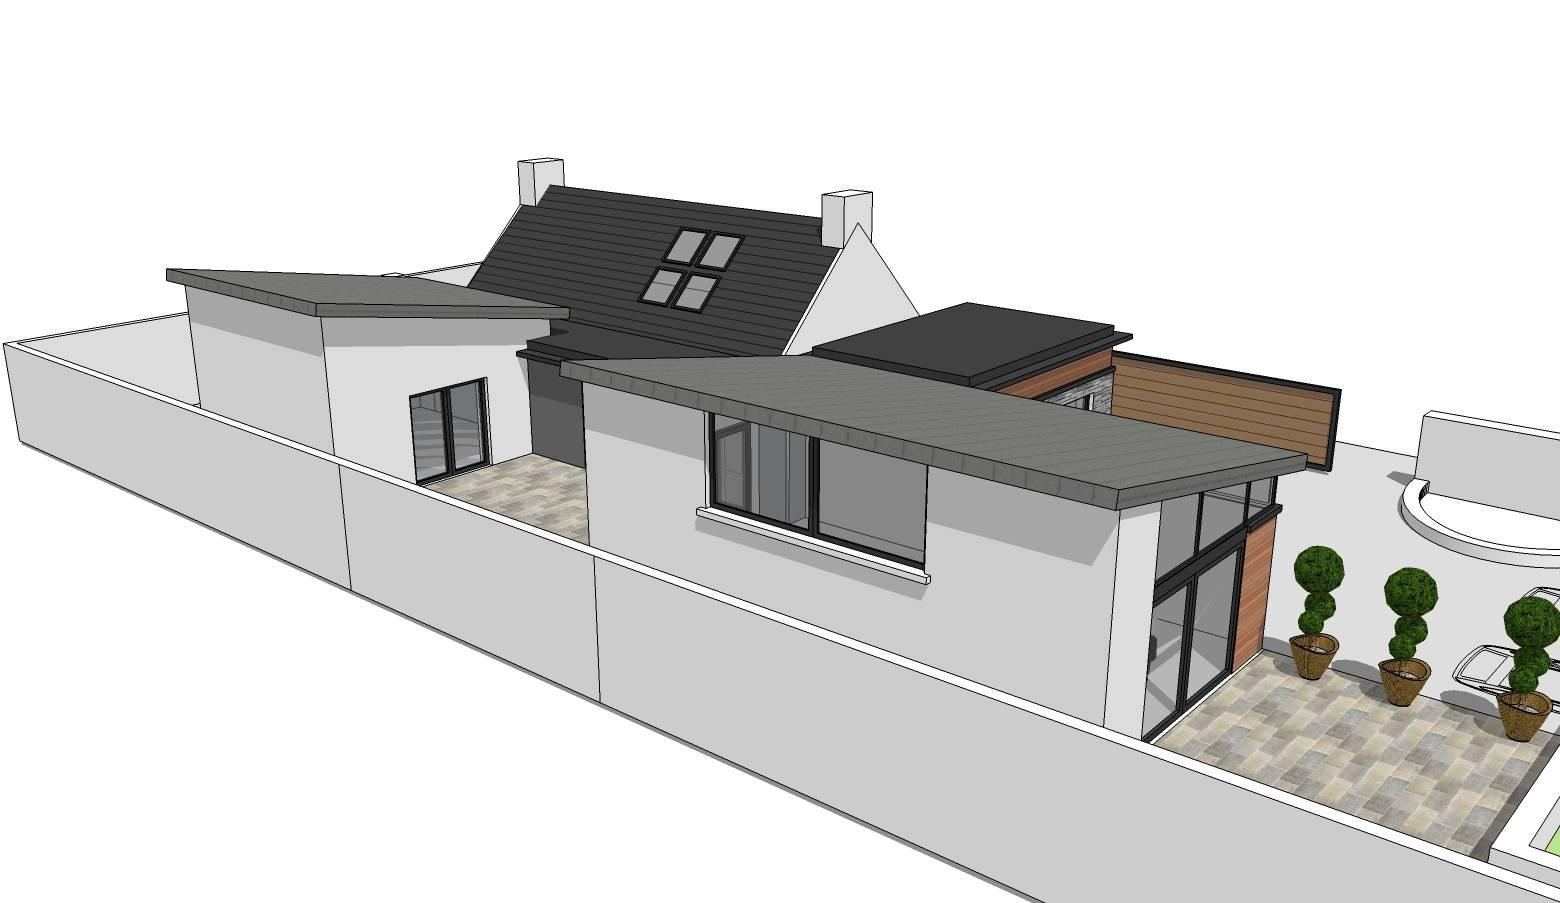 House extension plans for little island cork joe o for Little island design